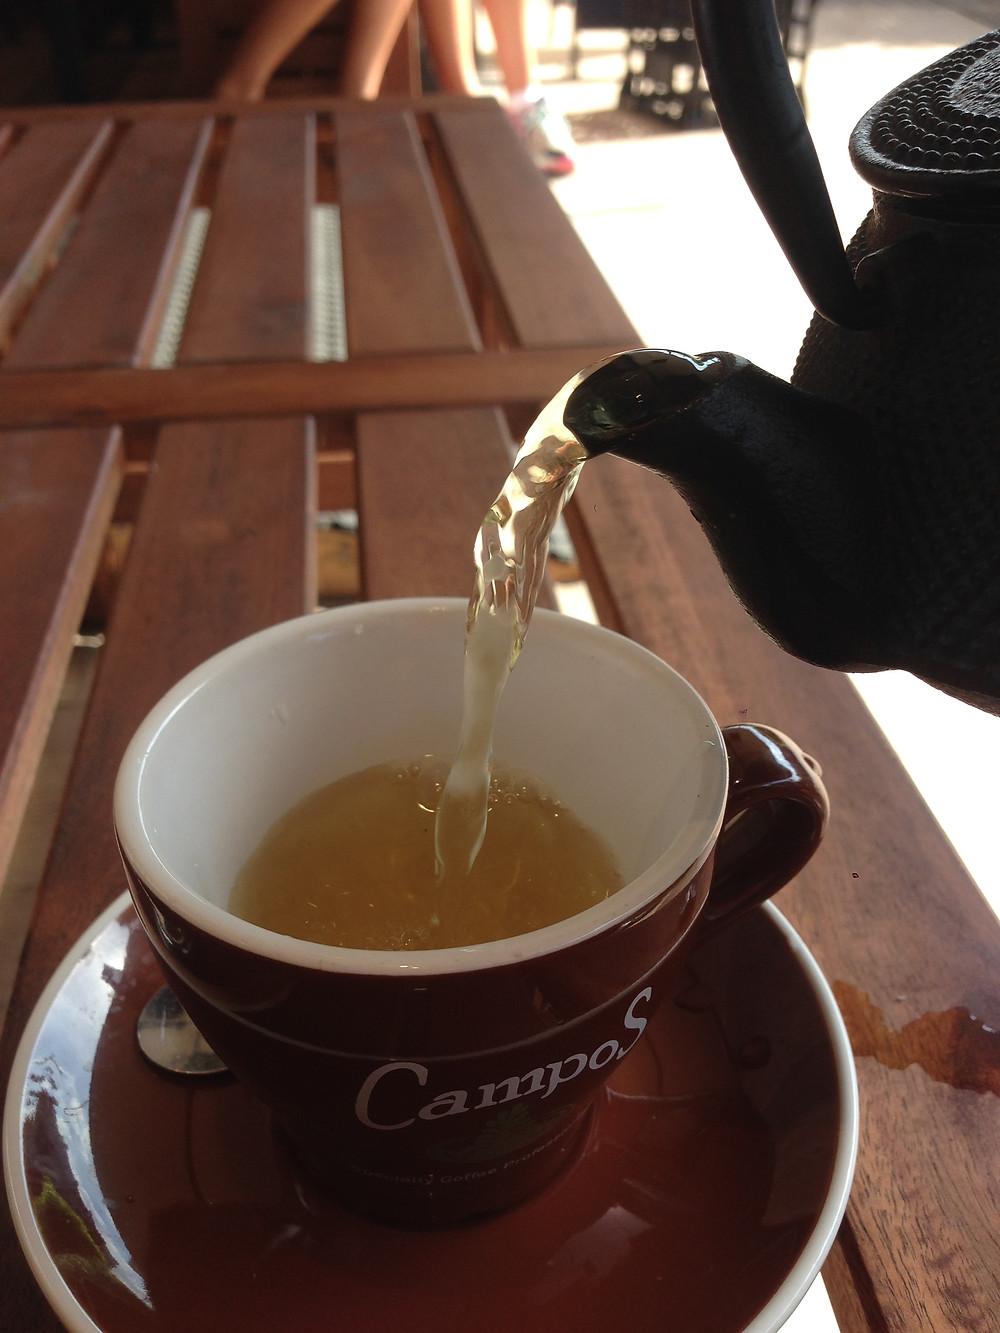 self care tea time ritual for balance